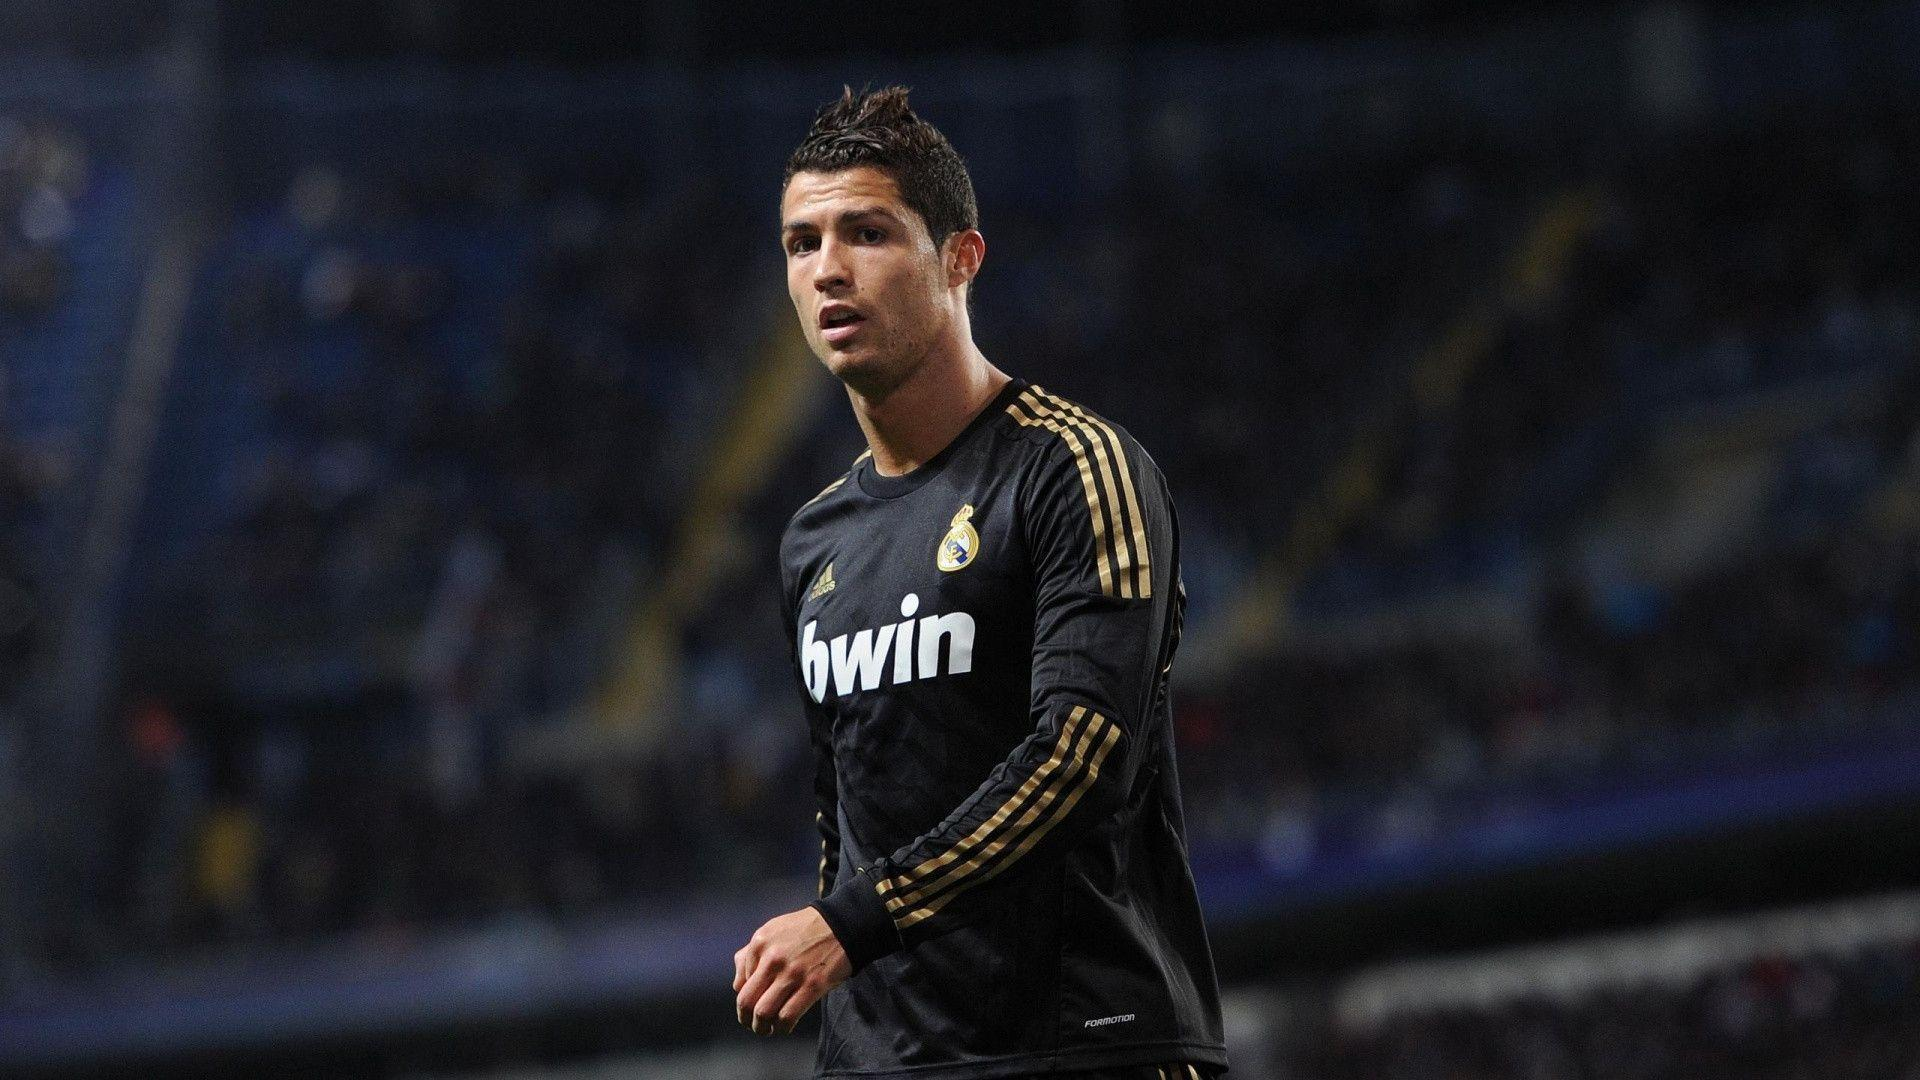 Cristiano Ronaldo HD Wallpaper - MixHD wallpapers